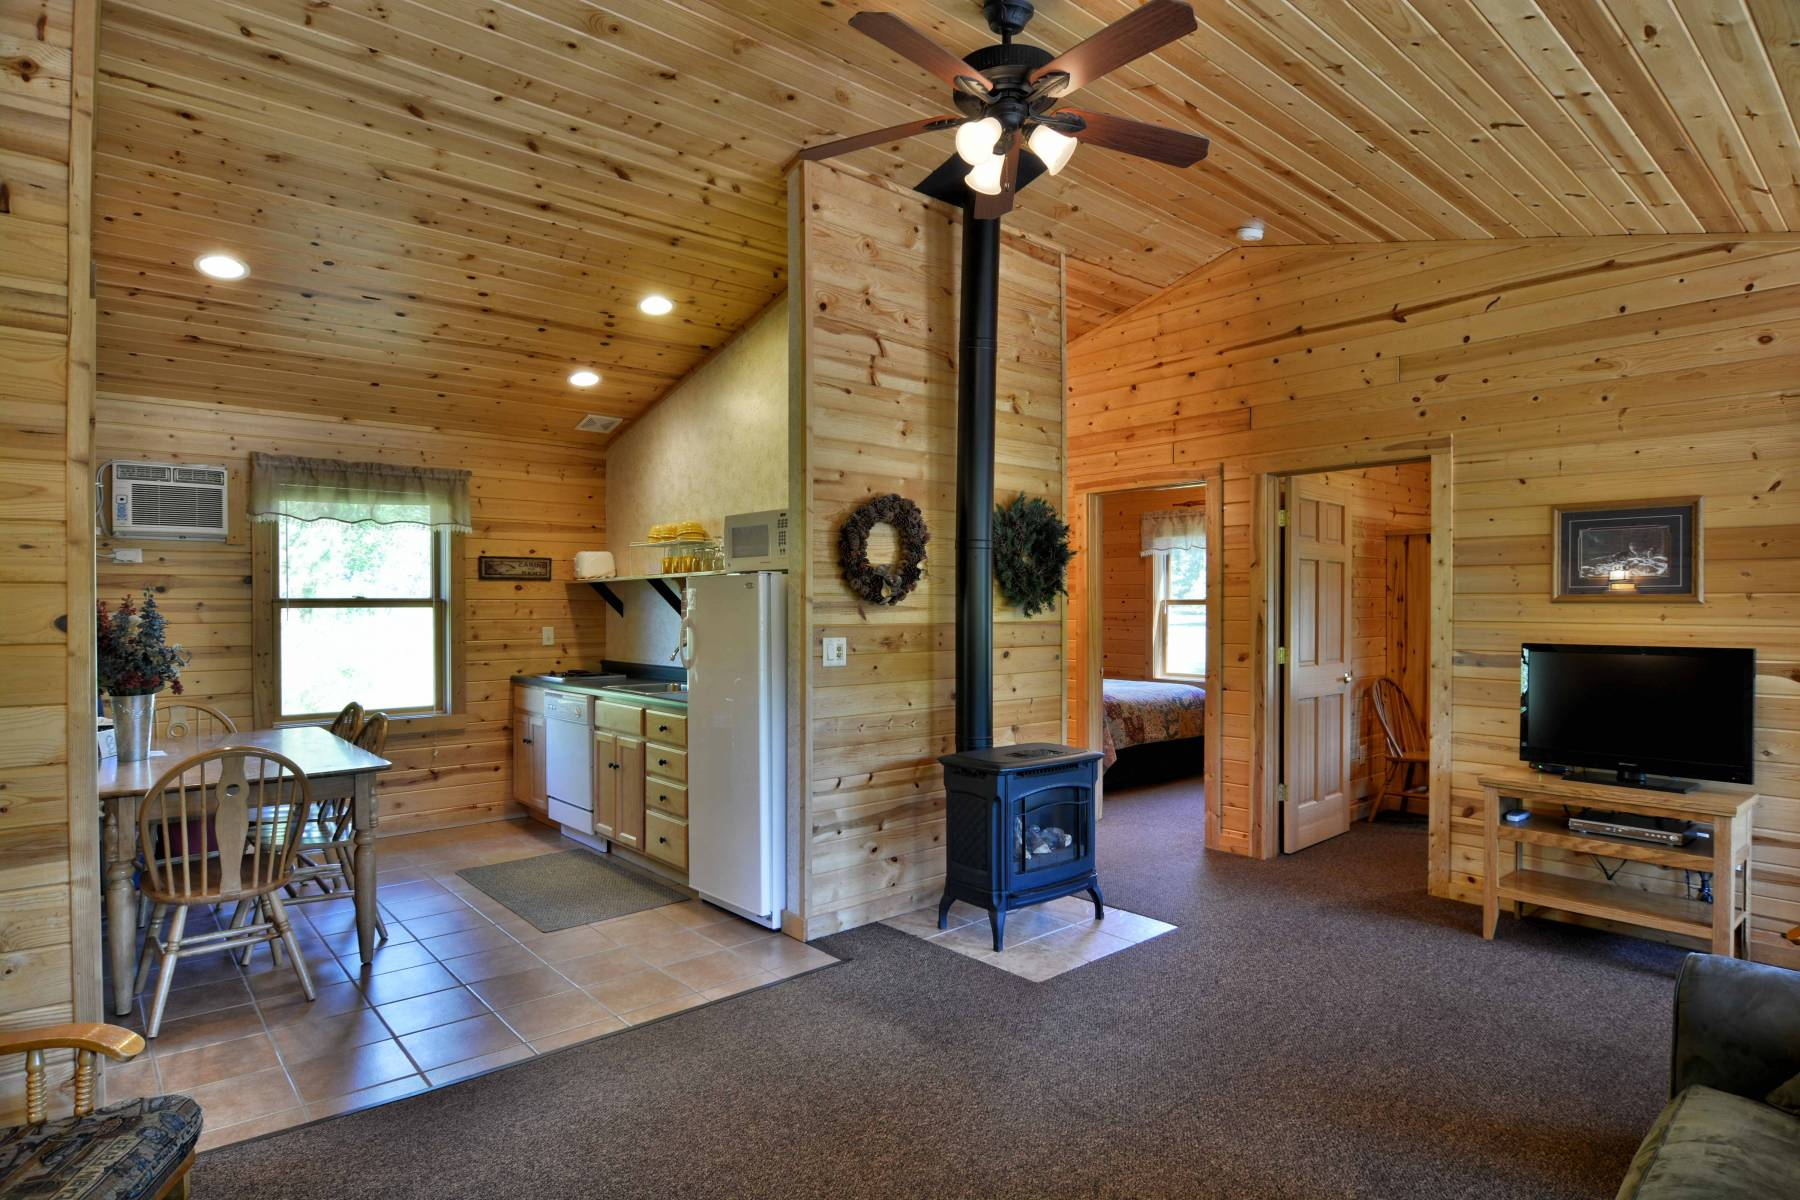 bayfield wisconsin lodging lake superior cottage rentals rh woodsidecottages com lake superior house rentals lake superior cabin rentals mn